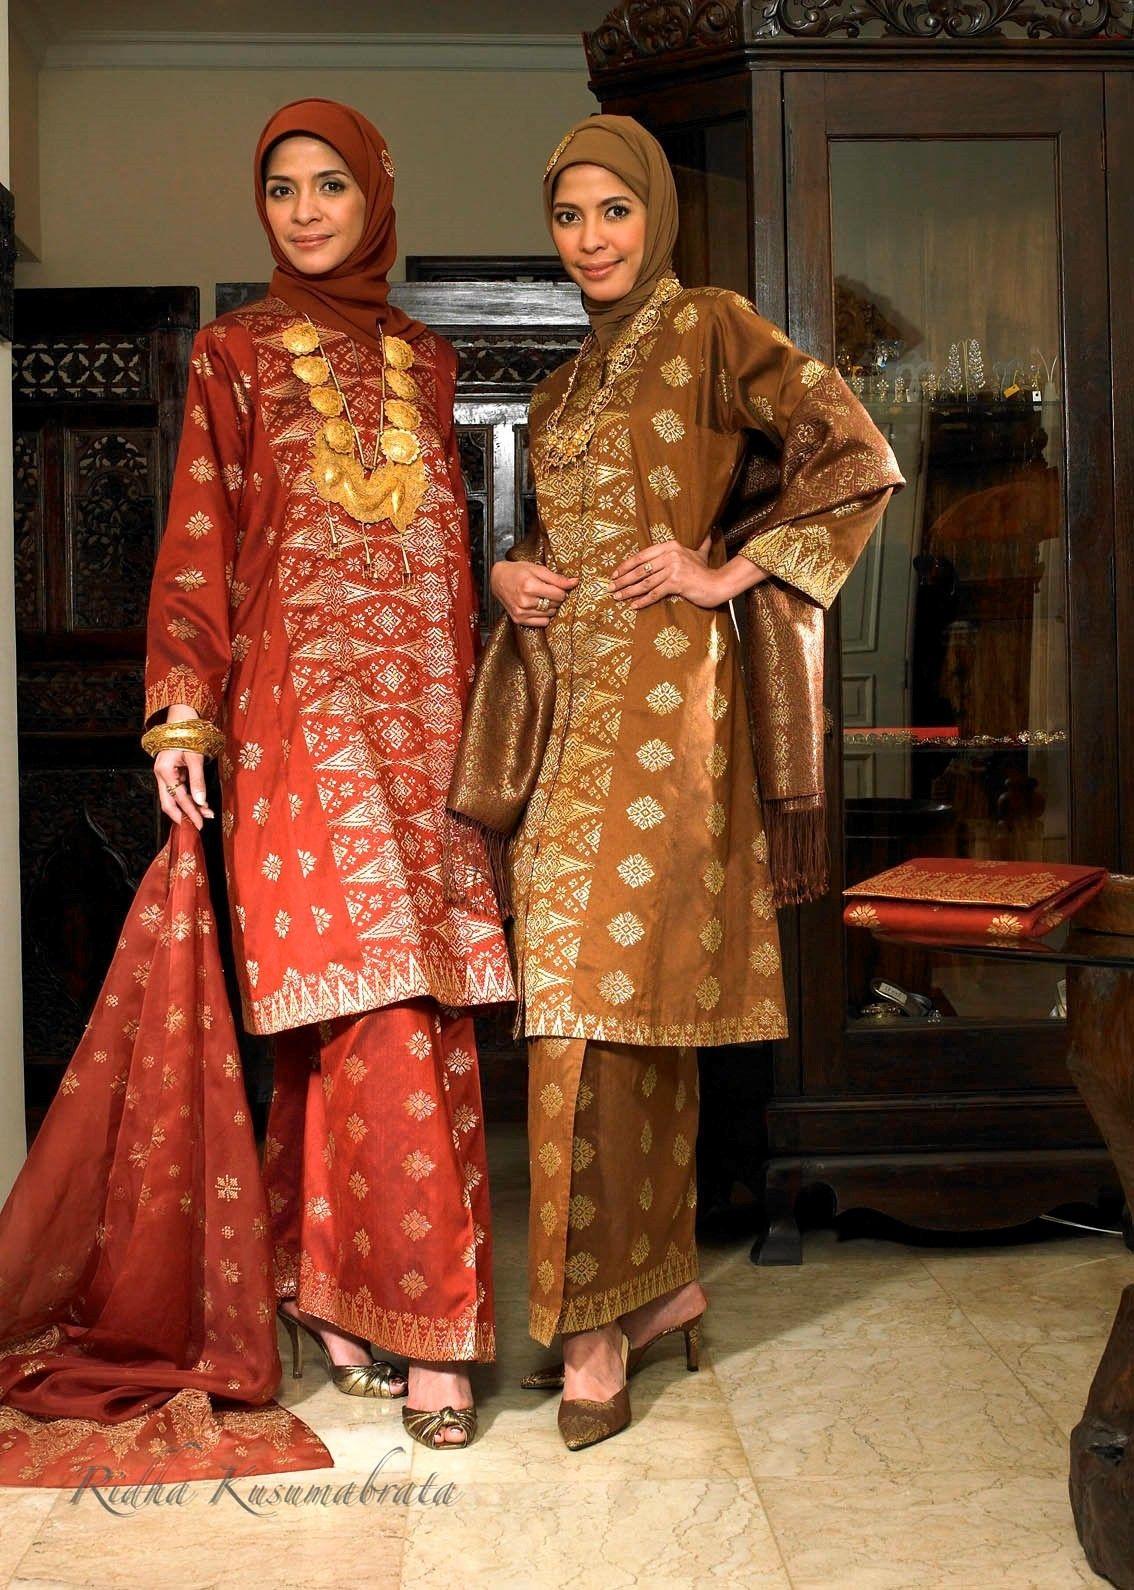 Kebaya Songket Riau  Model baju wanita, Pakaian islami, Pakaian